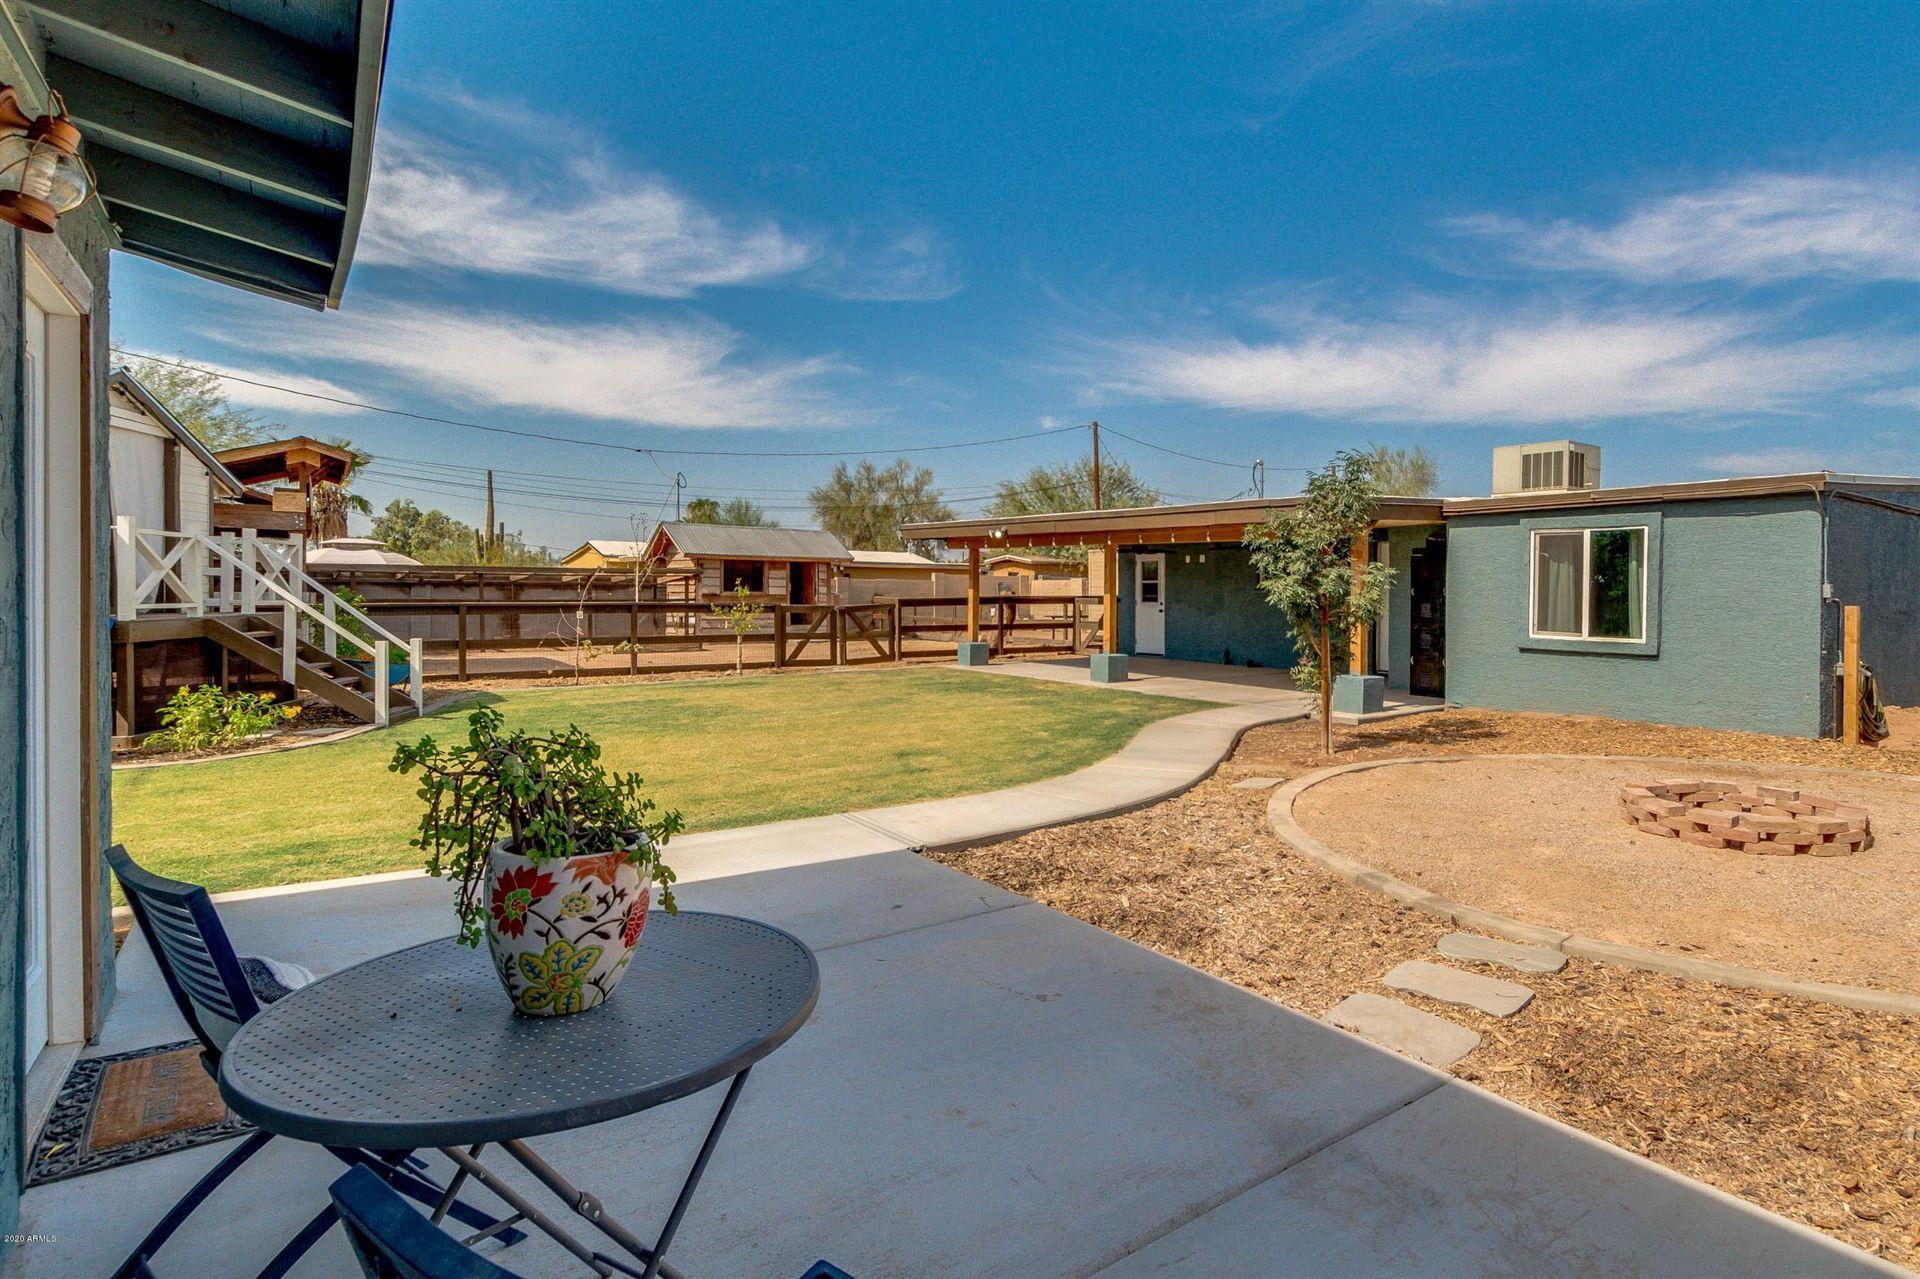 Photo for 11311 E 5th Avenue, Apache Junction, AZ 85120 (MLS # 6151463)